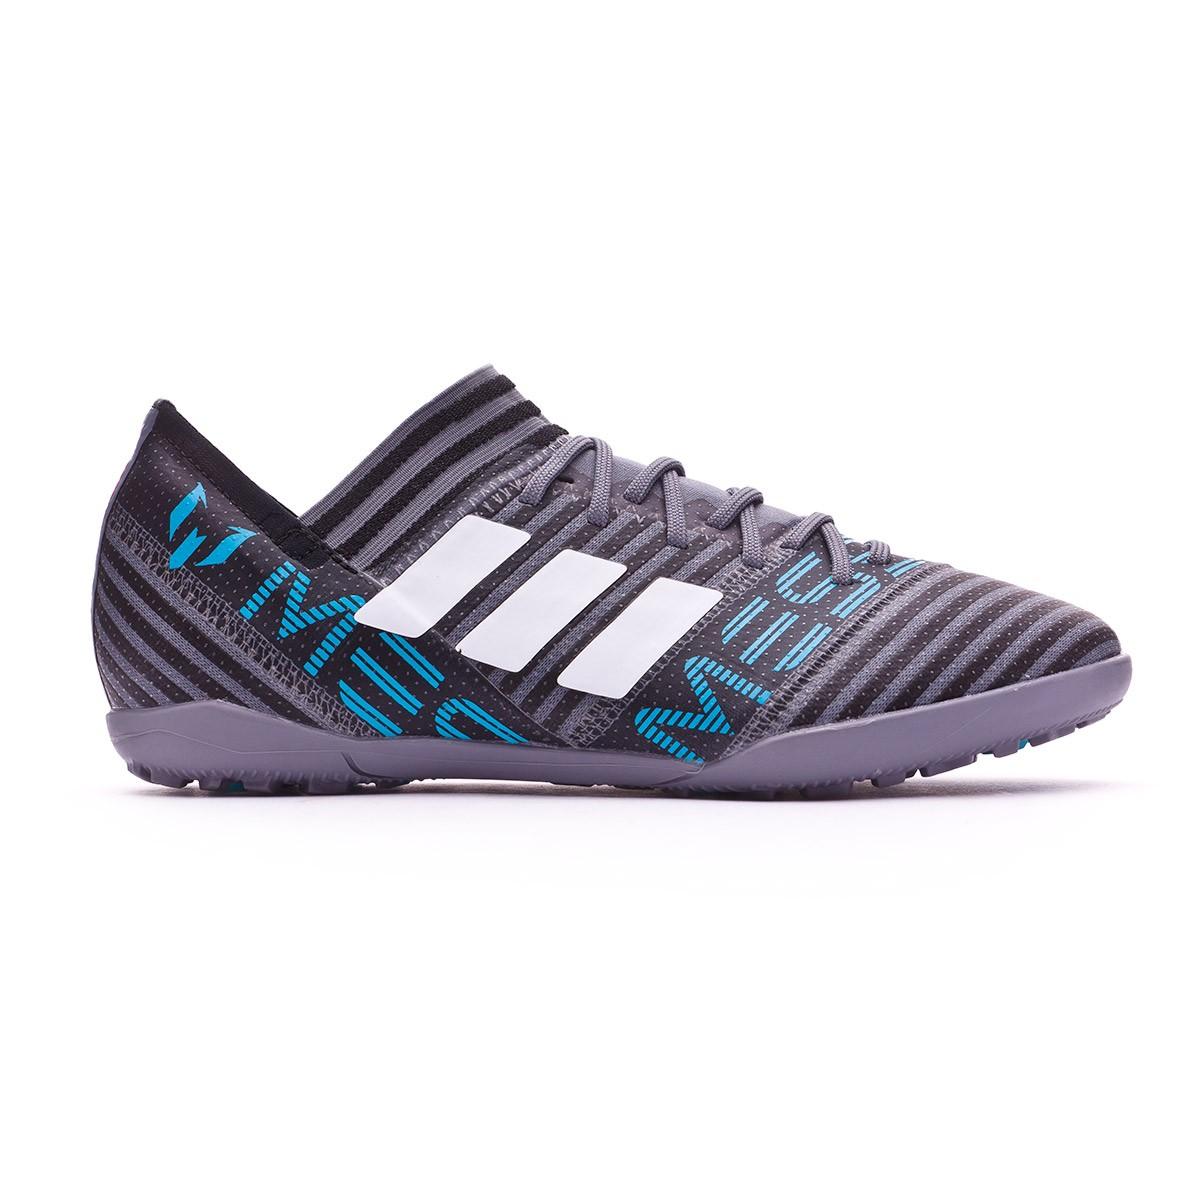 promo code 37b39 97648 ... Zapatilla Nemeziz Messi Tango 17.3 Turf Niño Grey-White-Core black.  CATEGORY. Football boots · adidas football boots